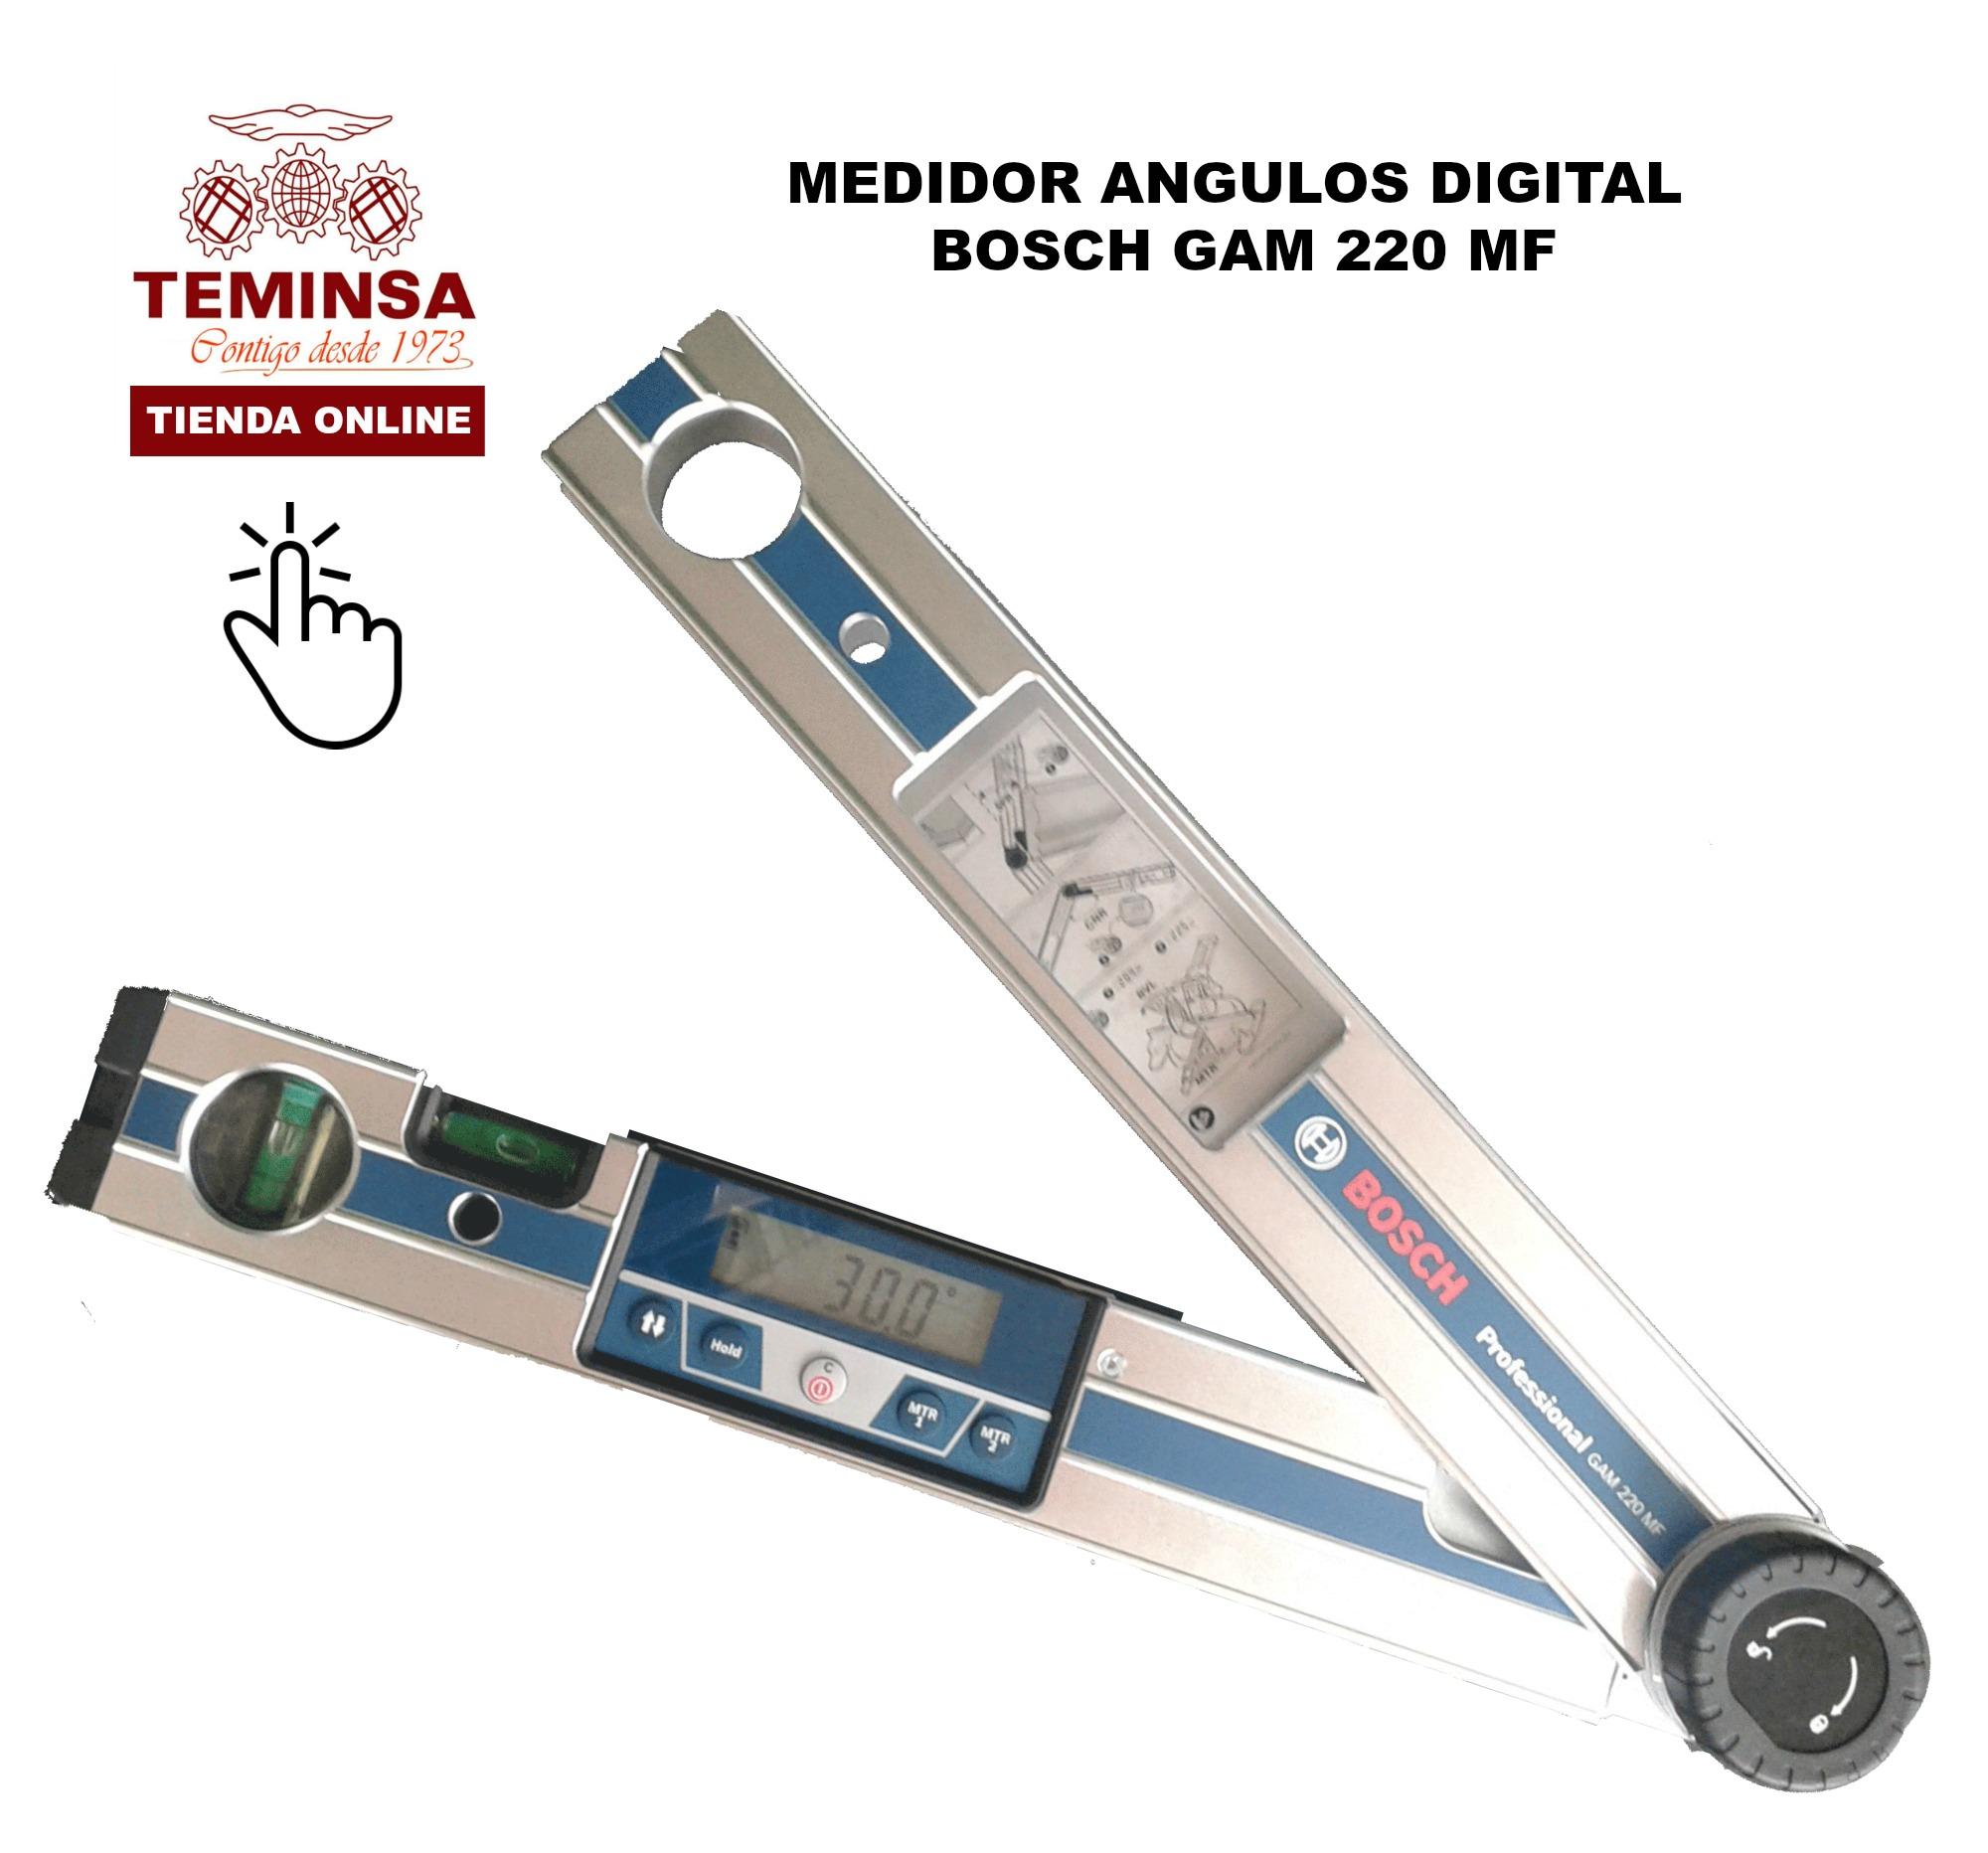 MEDIDOR ANGULOS DIGITAL BOSCH GAM 220 MF TEMIINSA ONLINE